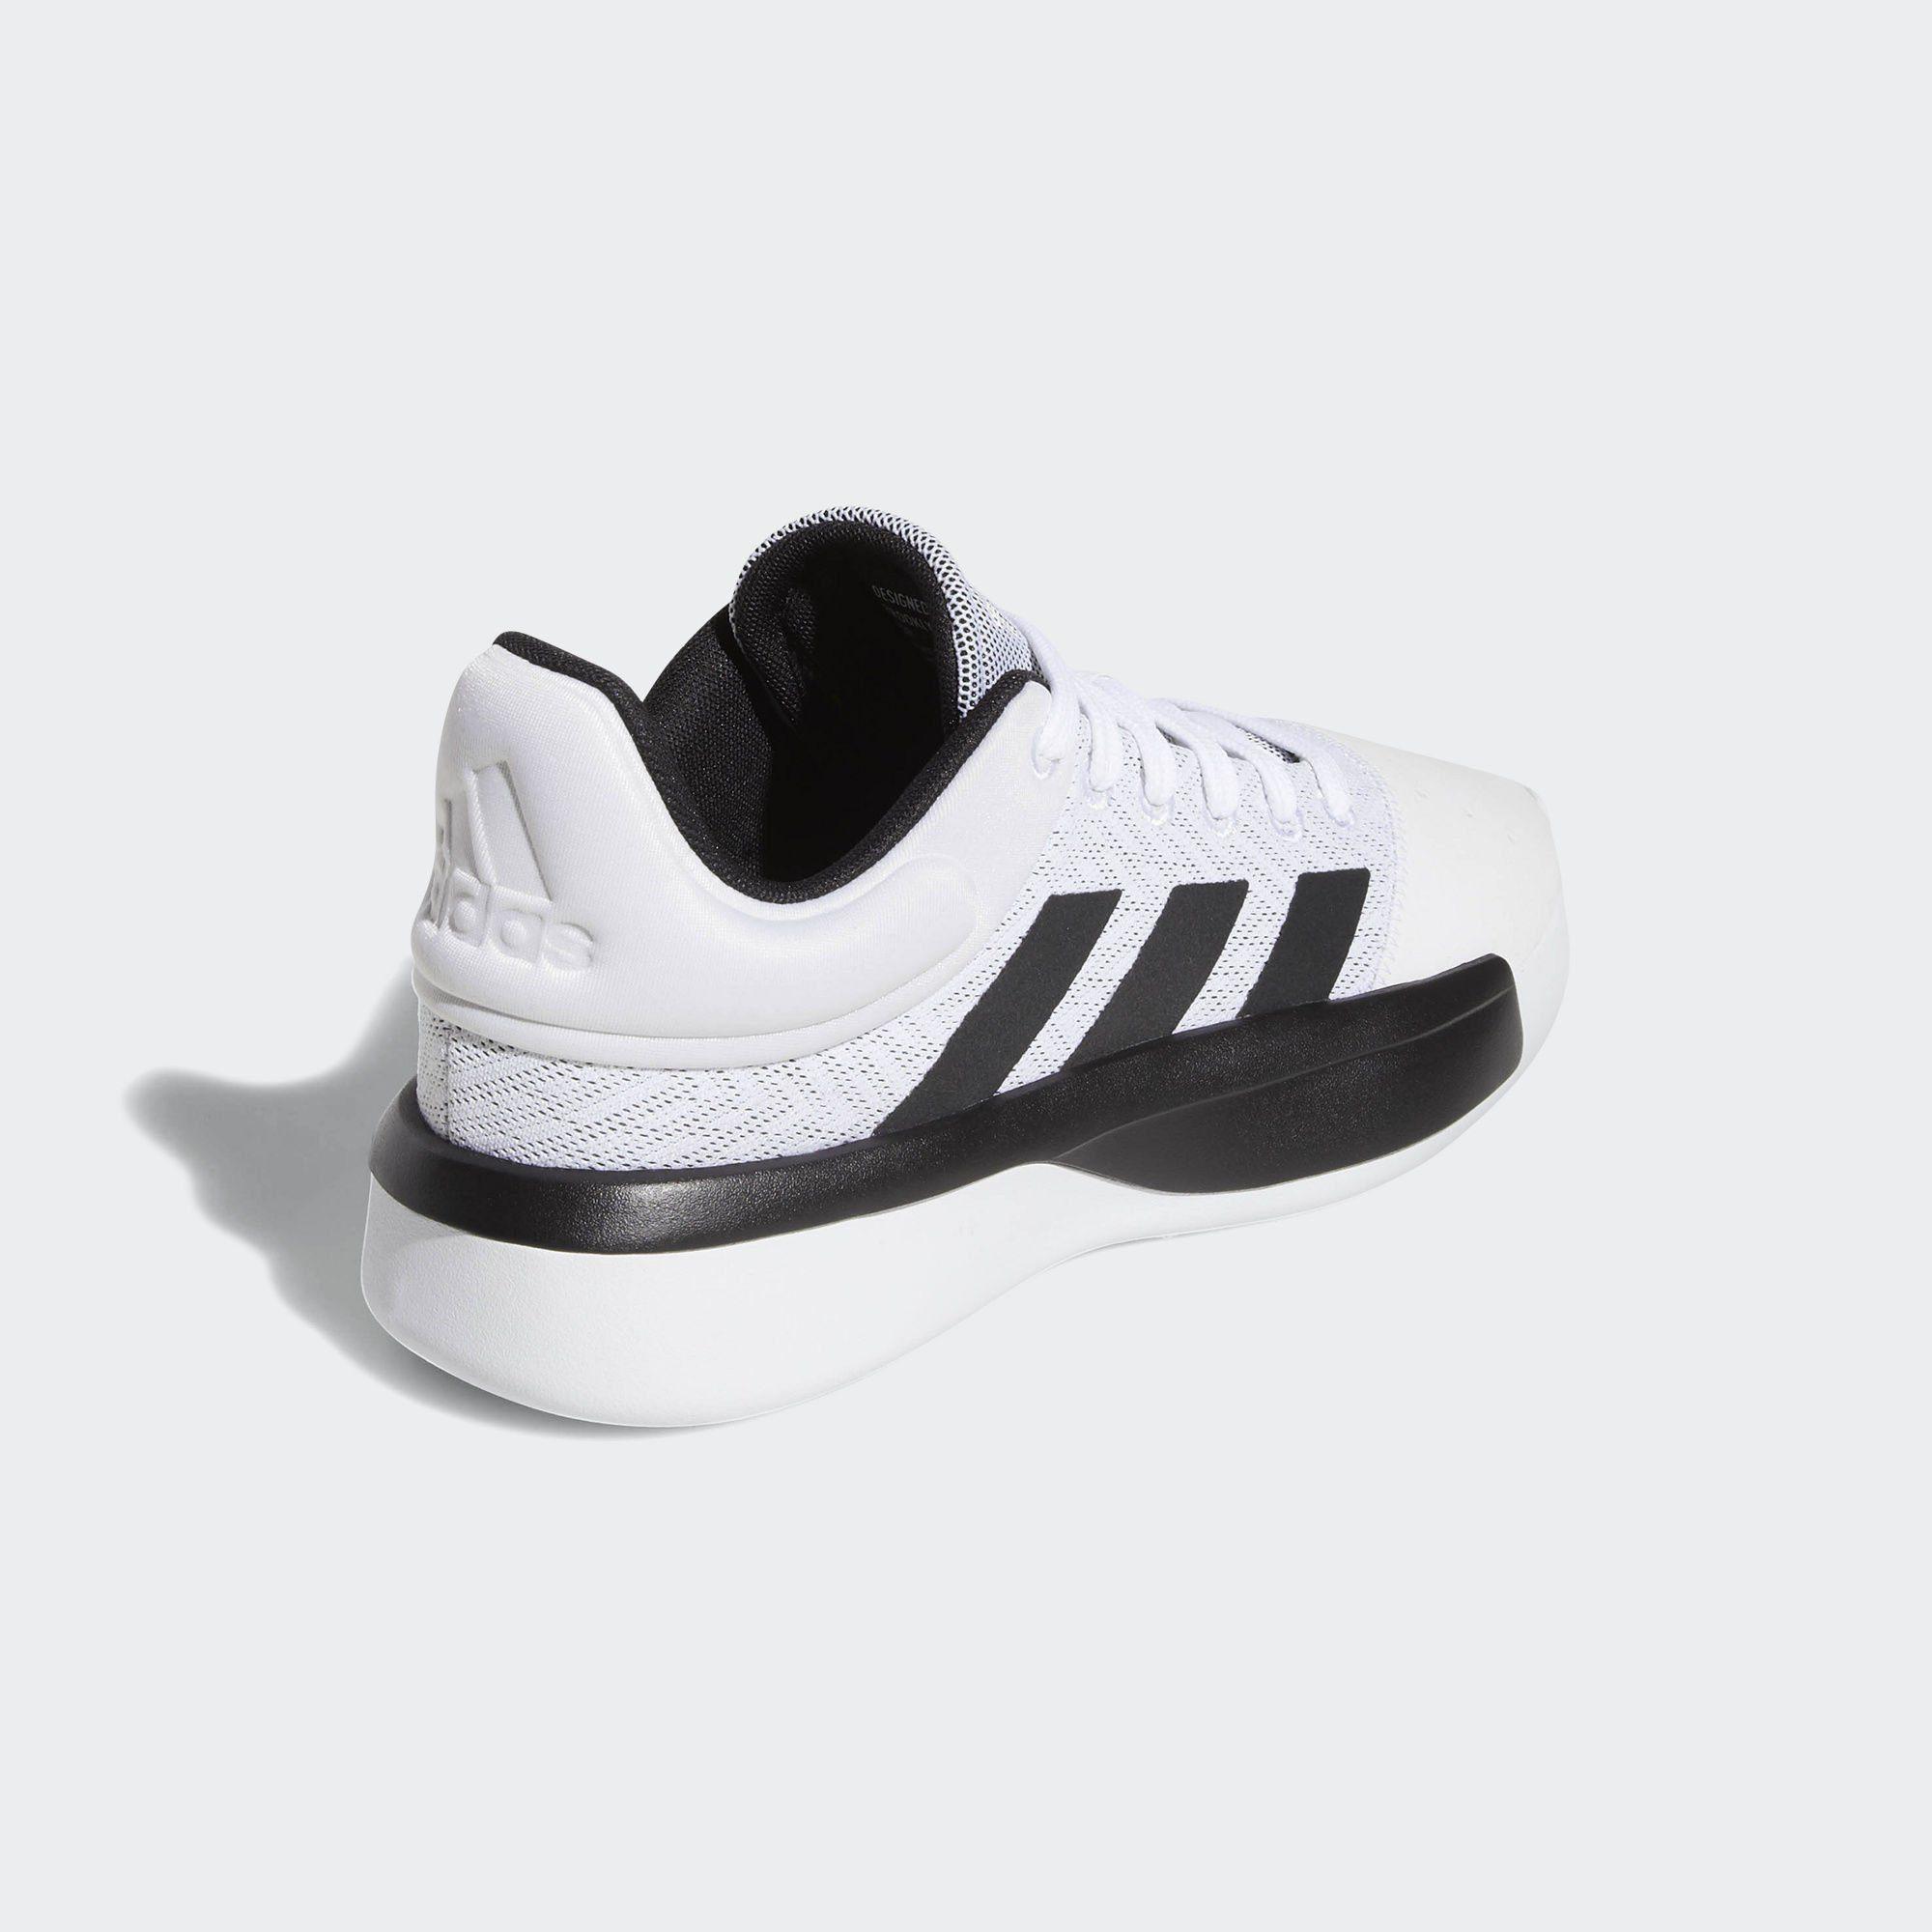 White Performance Fitnessschuh Low Online Artikel Adidas 2019 Adversary nr Schuh Kaufen Pro 3644055799 OFnqA